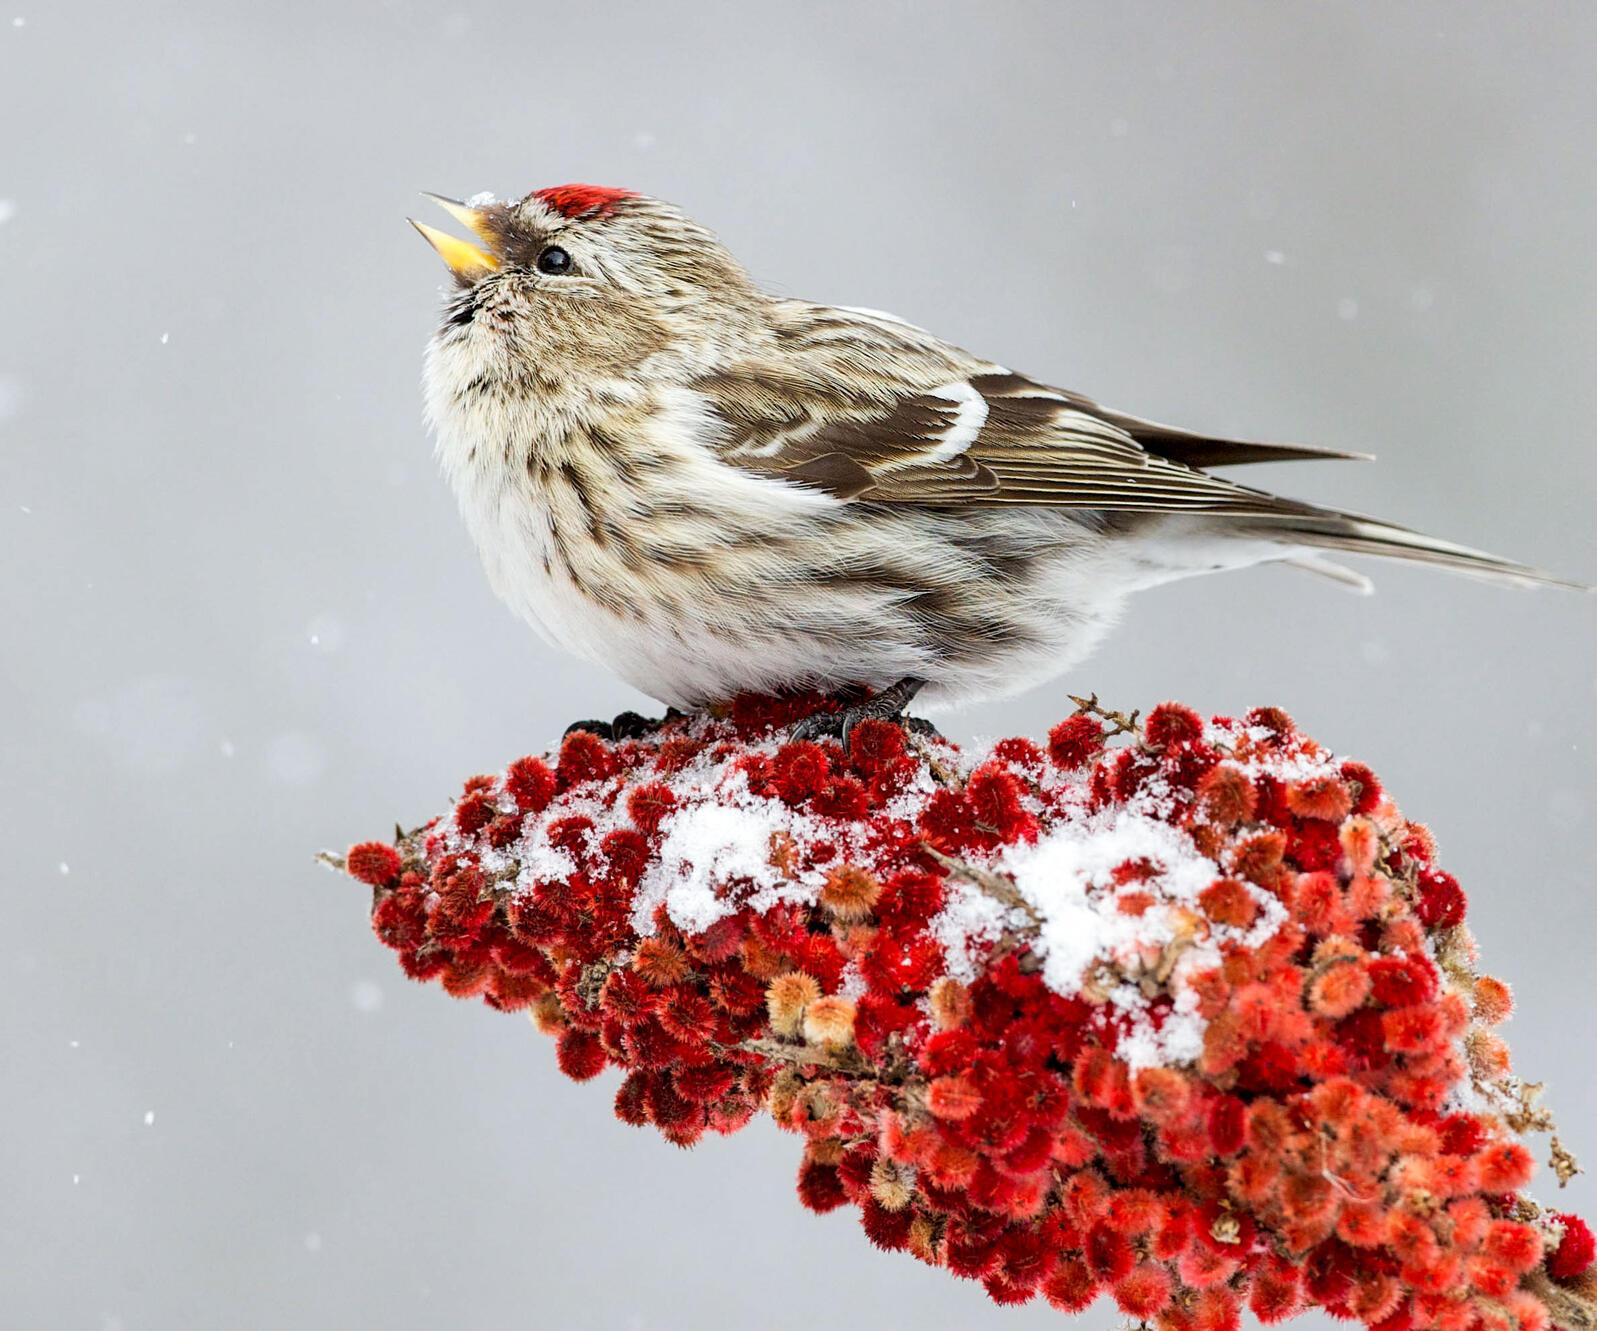 Common Redpoll on Staghorn Sumac. Missy Mandel/Great Backyard Bird Count